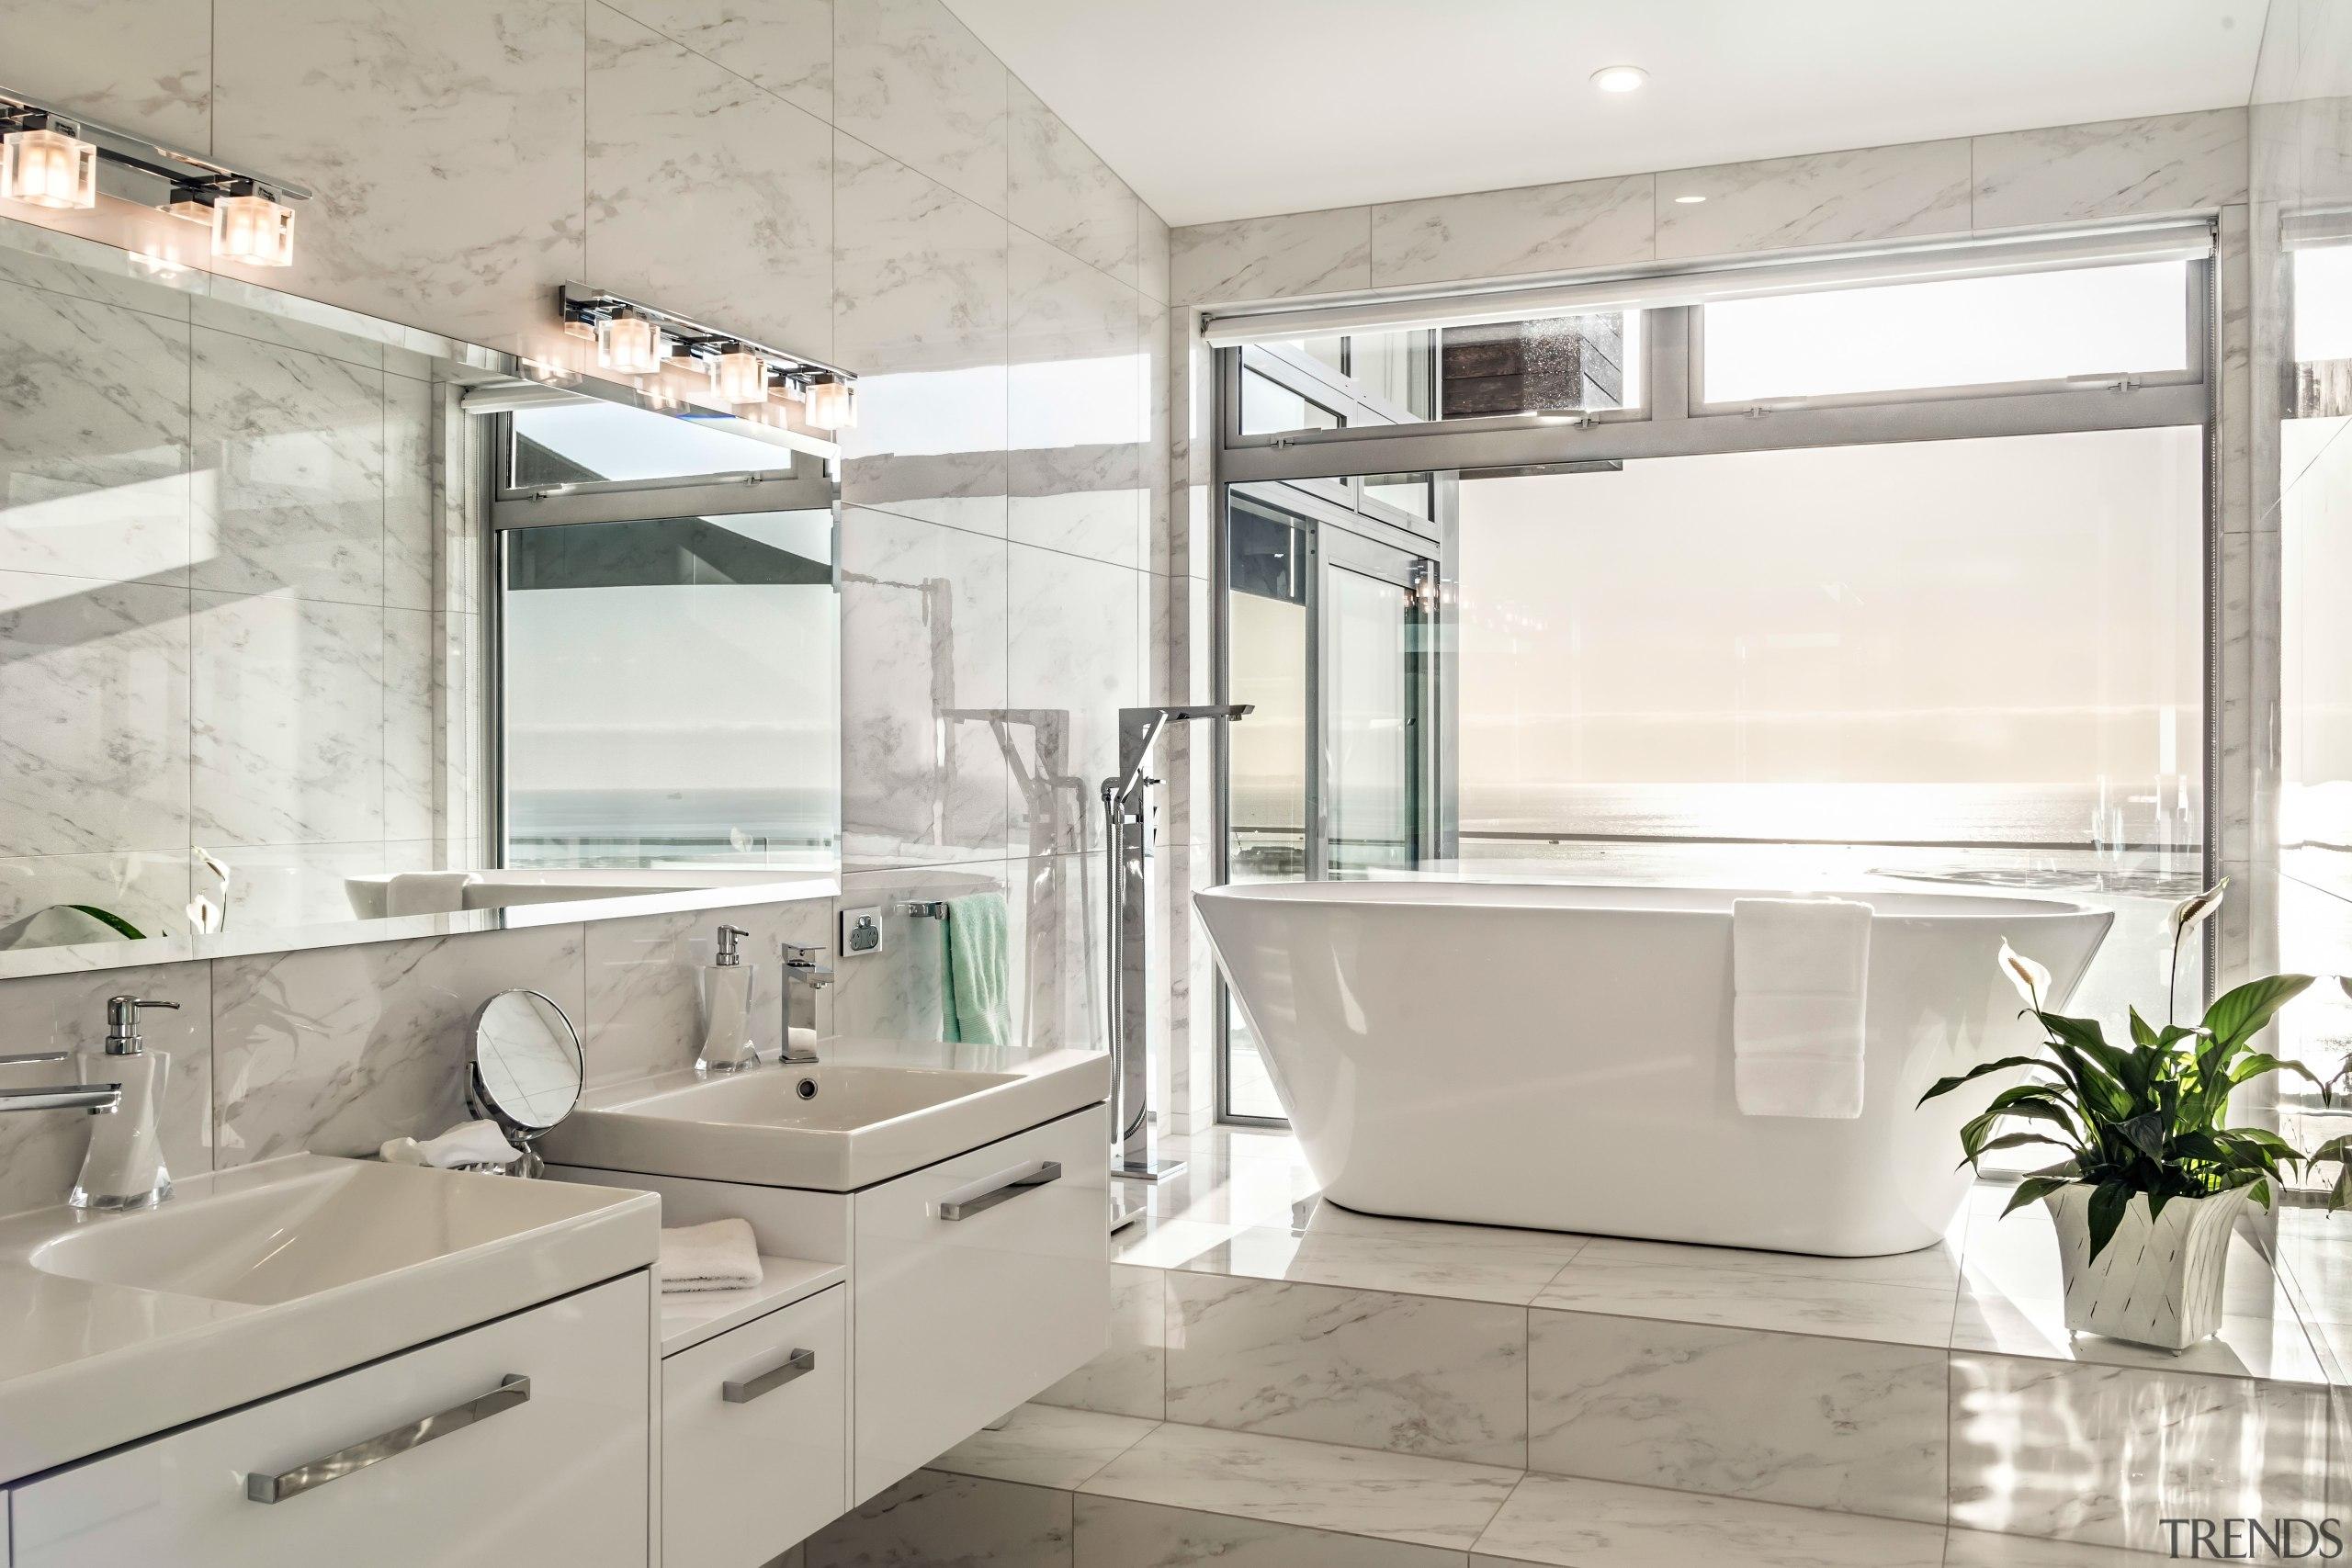 Soaking up the scenery  the bathtub arguably bathroom, interior design, sink, gray